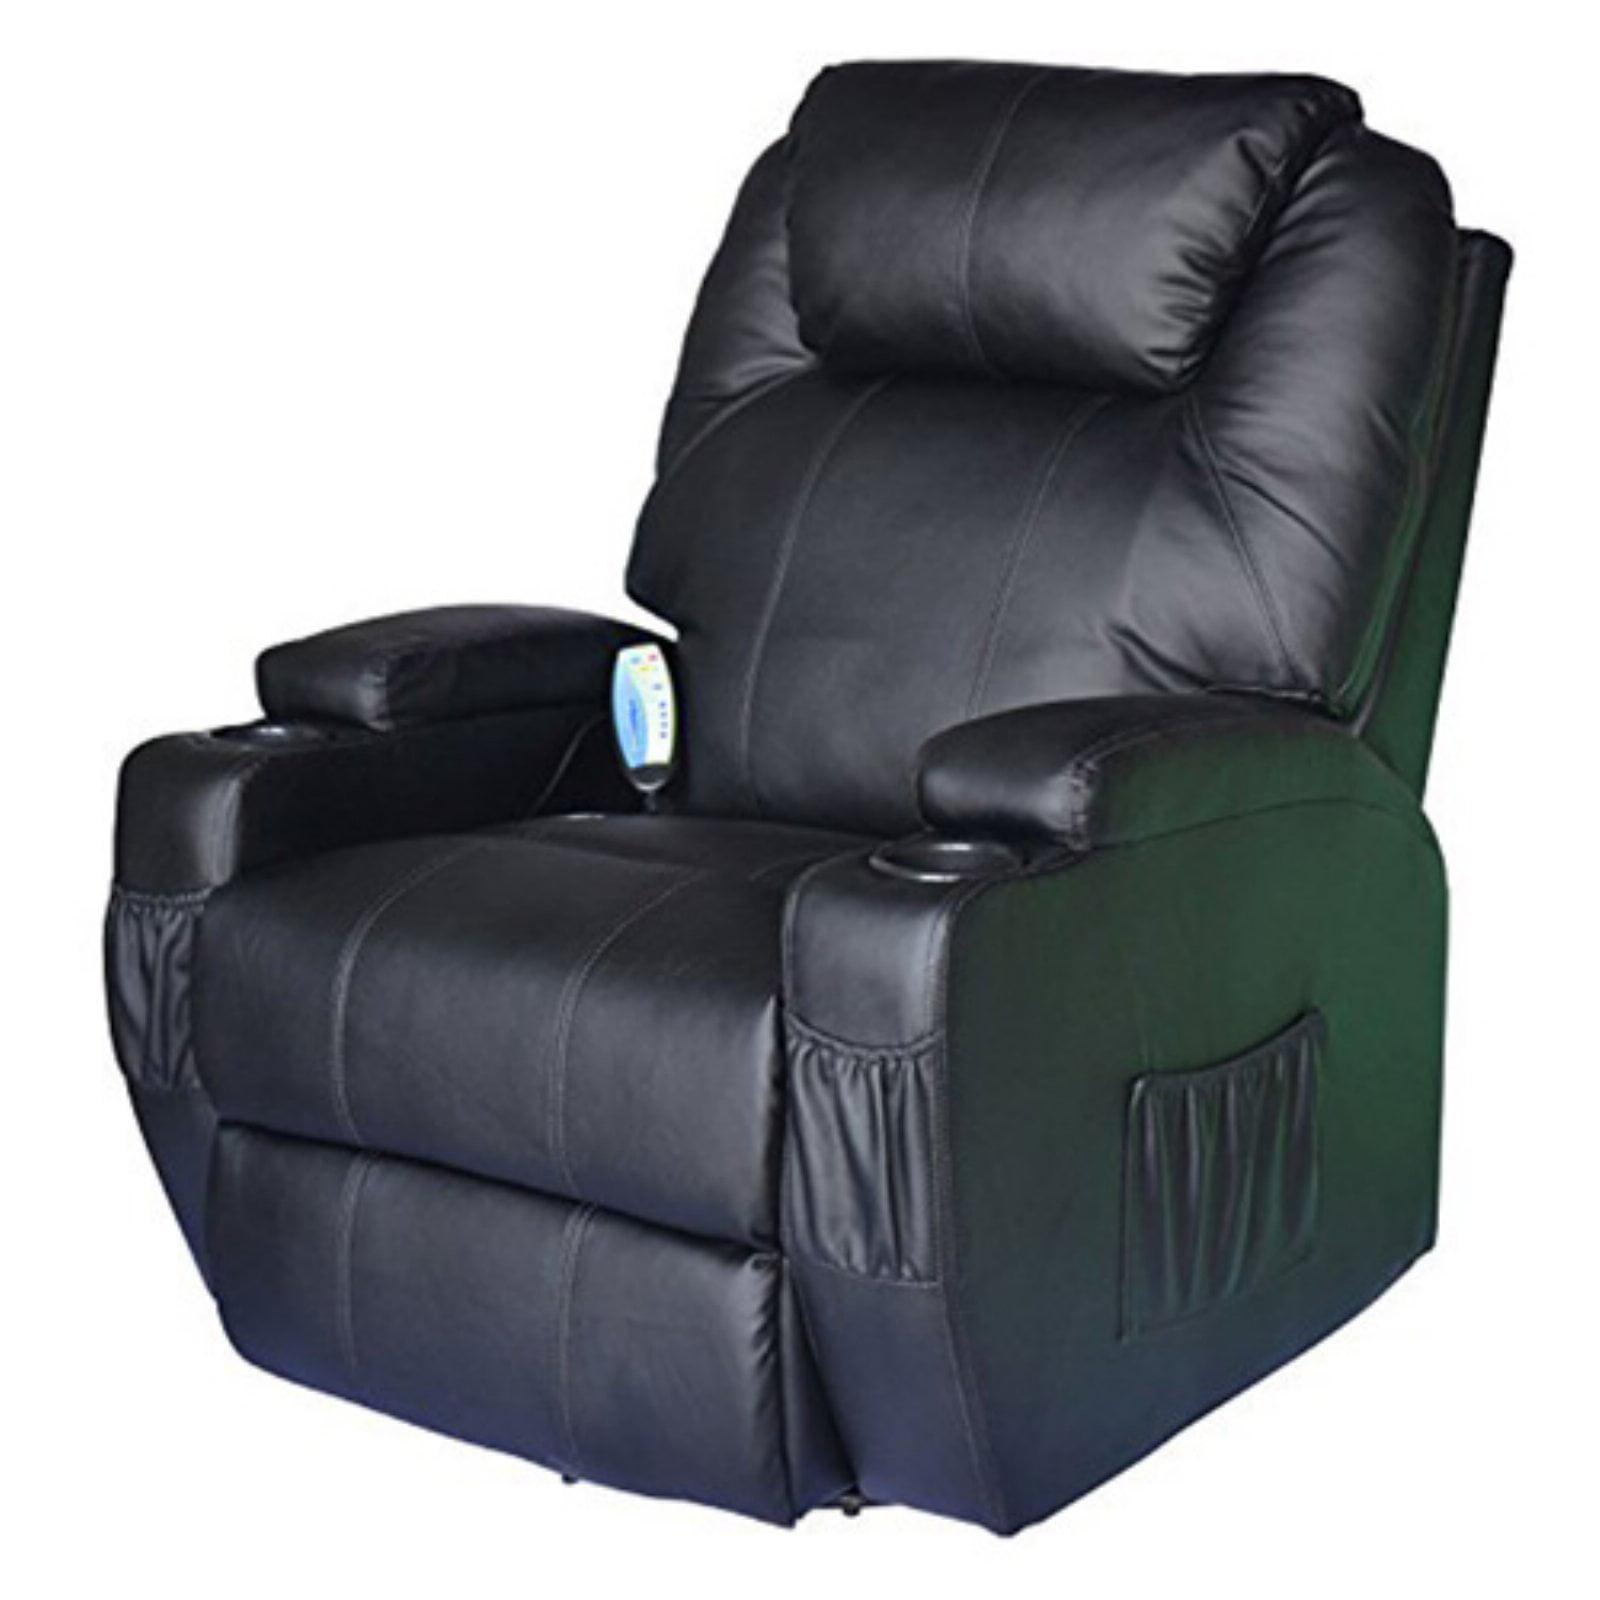 HomCom Heating Vibrating PU Leather Massage Recliner Chair